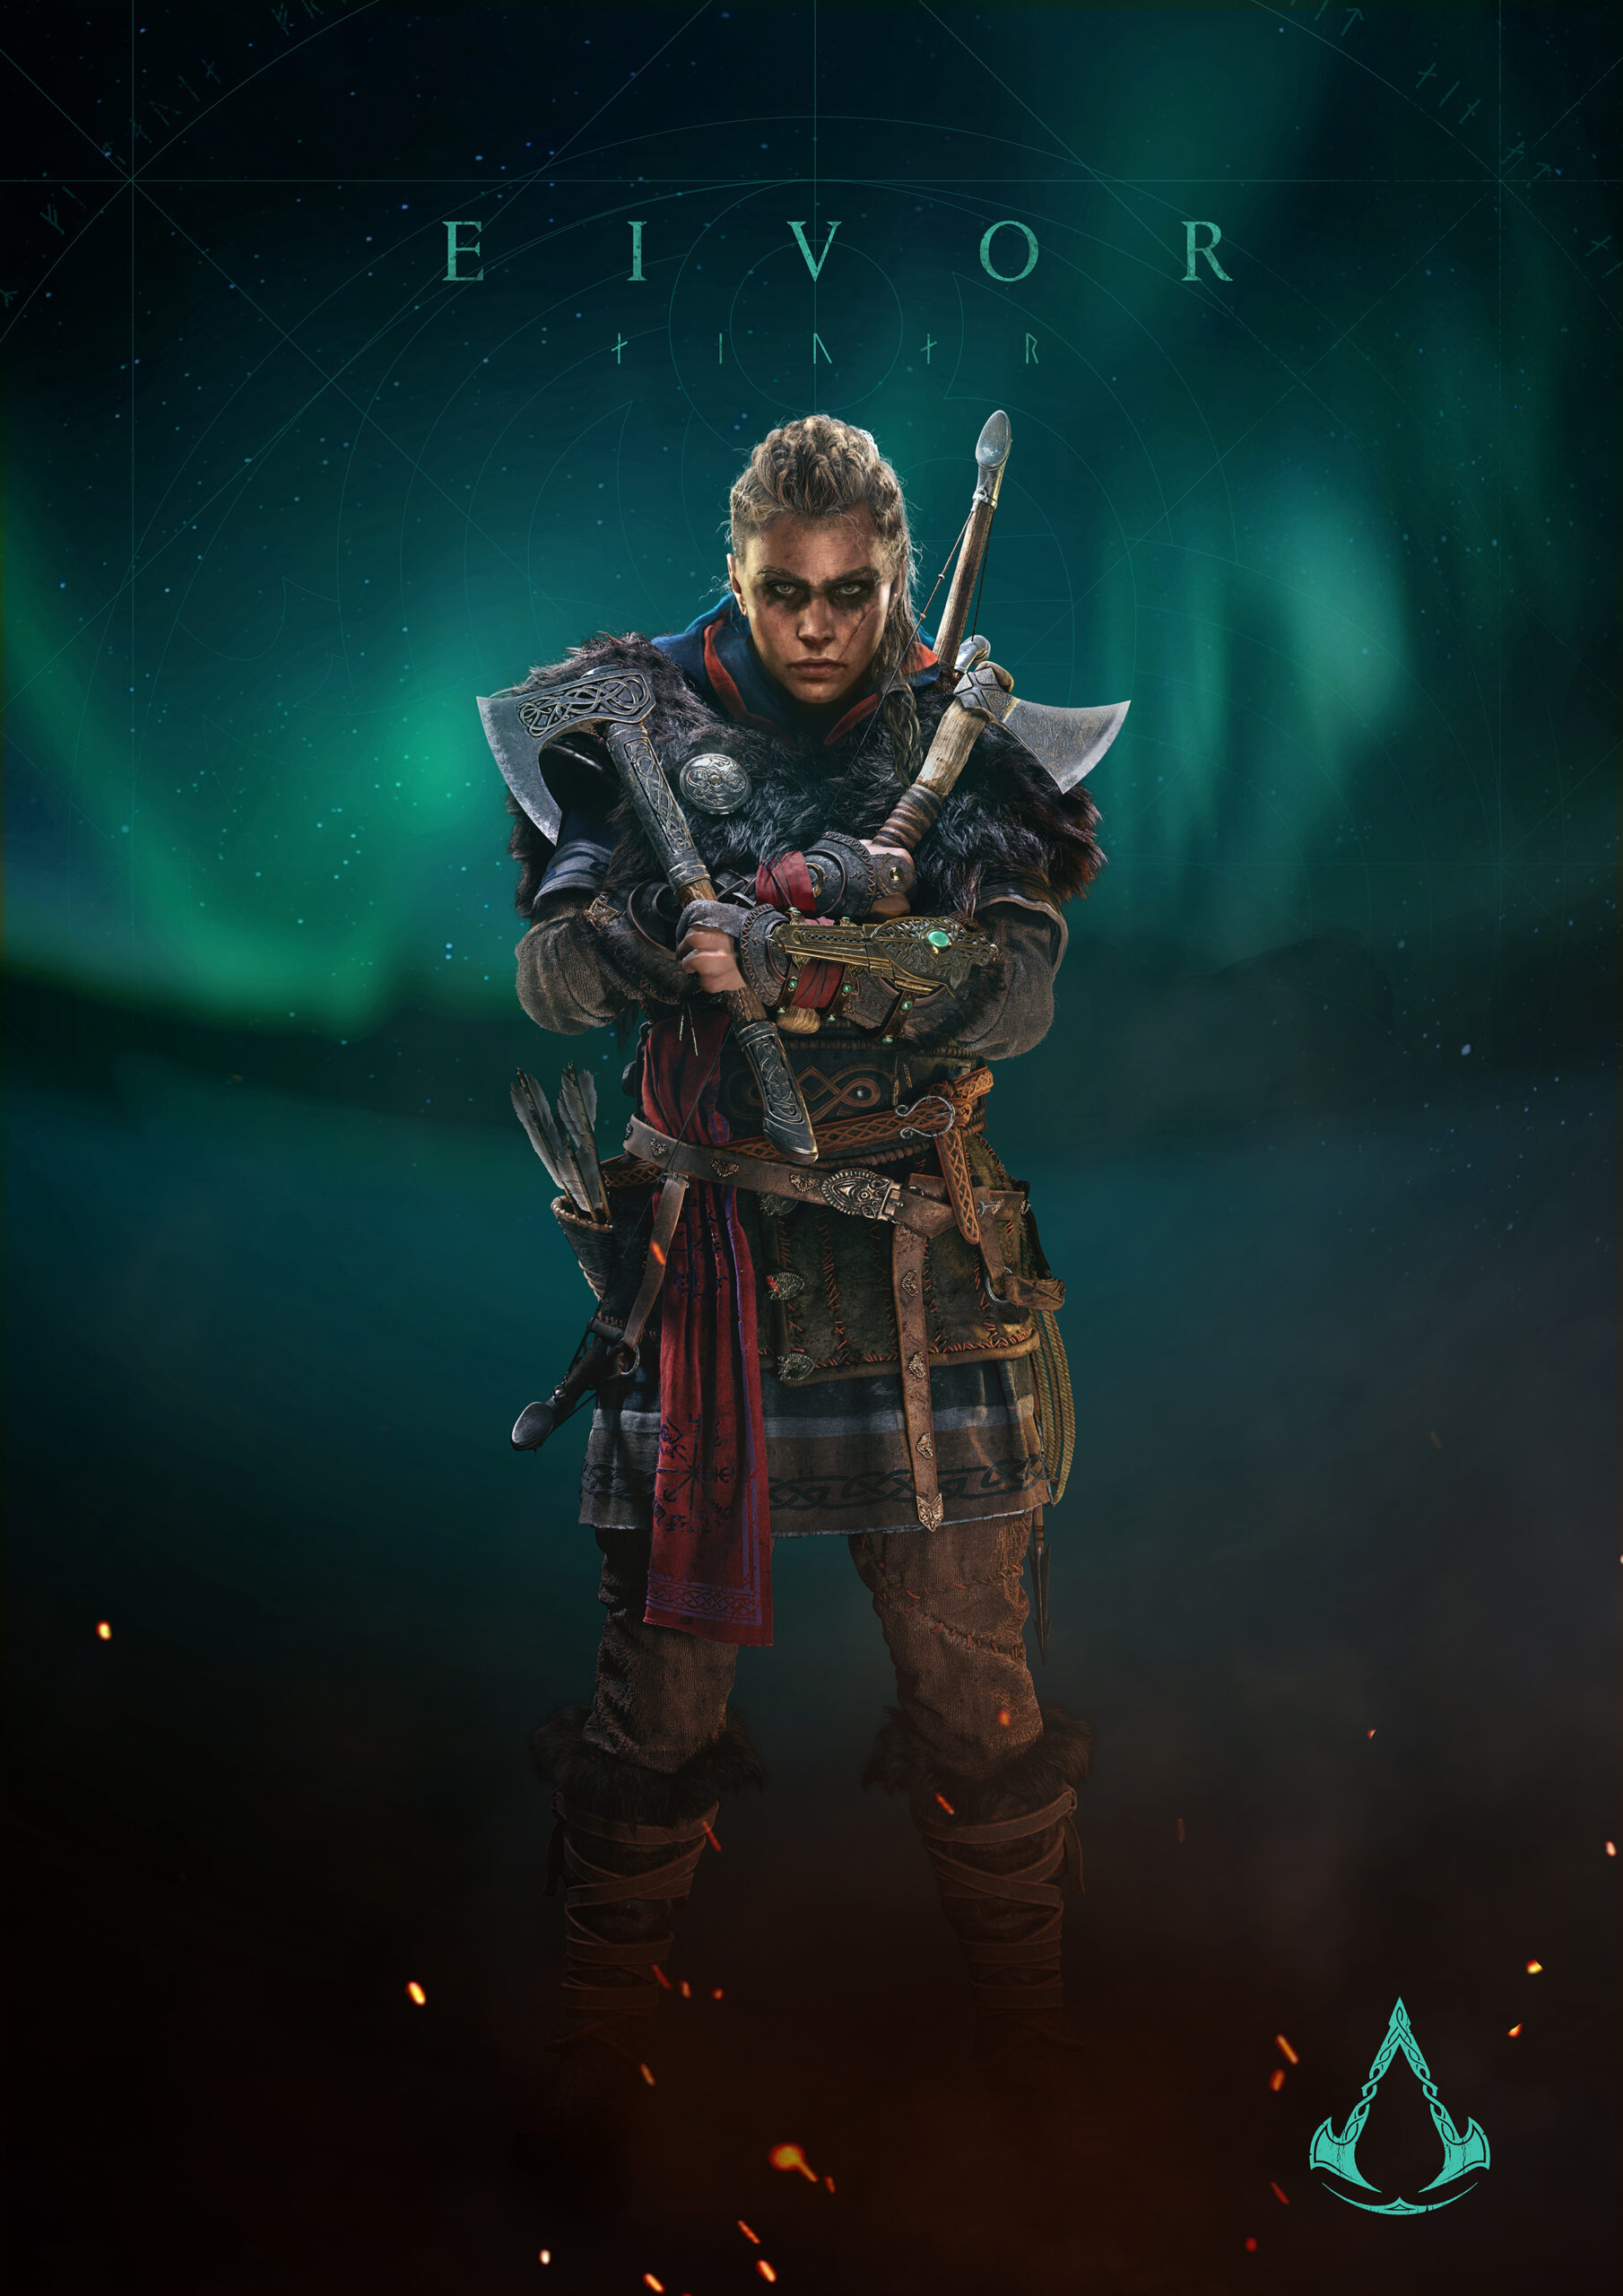 Assassins Creed Valhalla Character Render 1